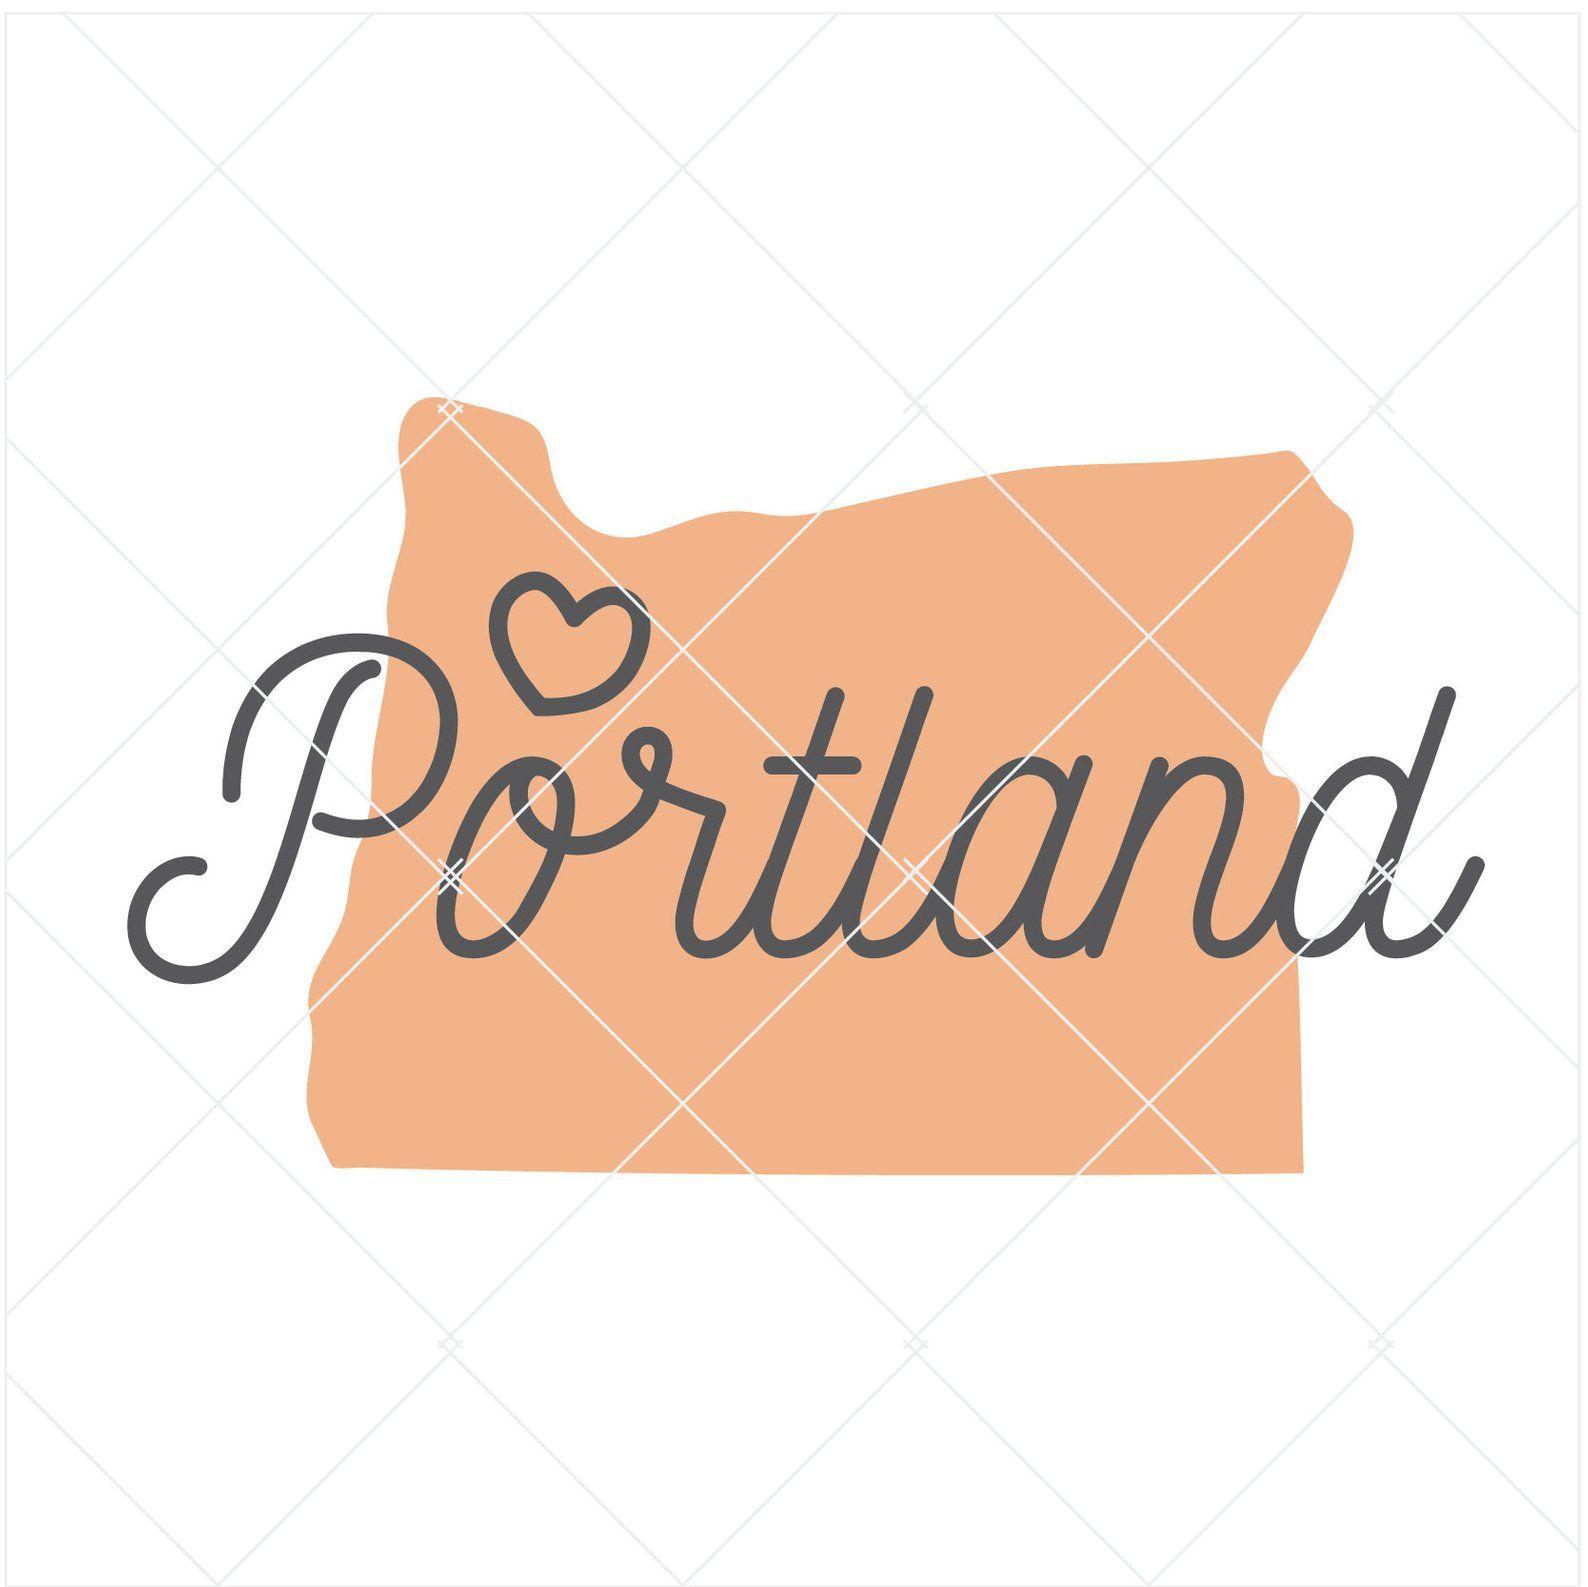 Portland Oregon SVG State love Shape City Word Art